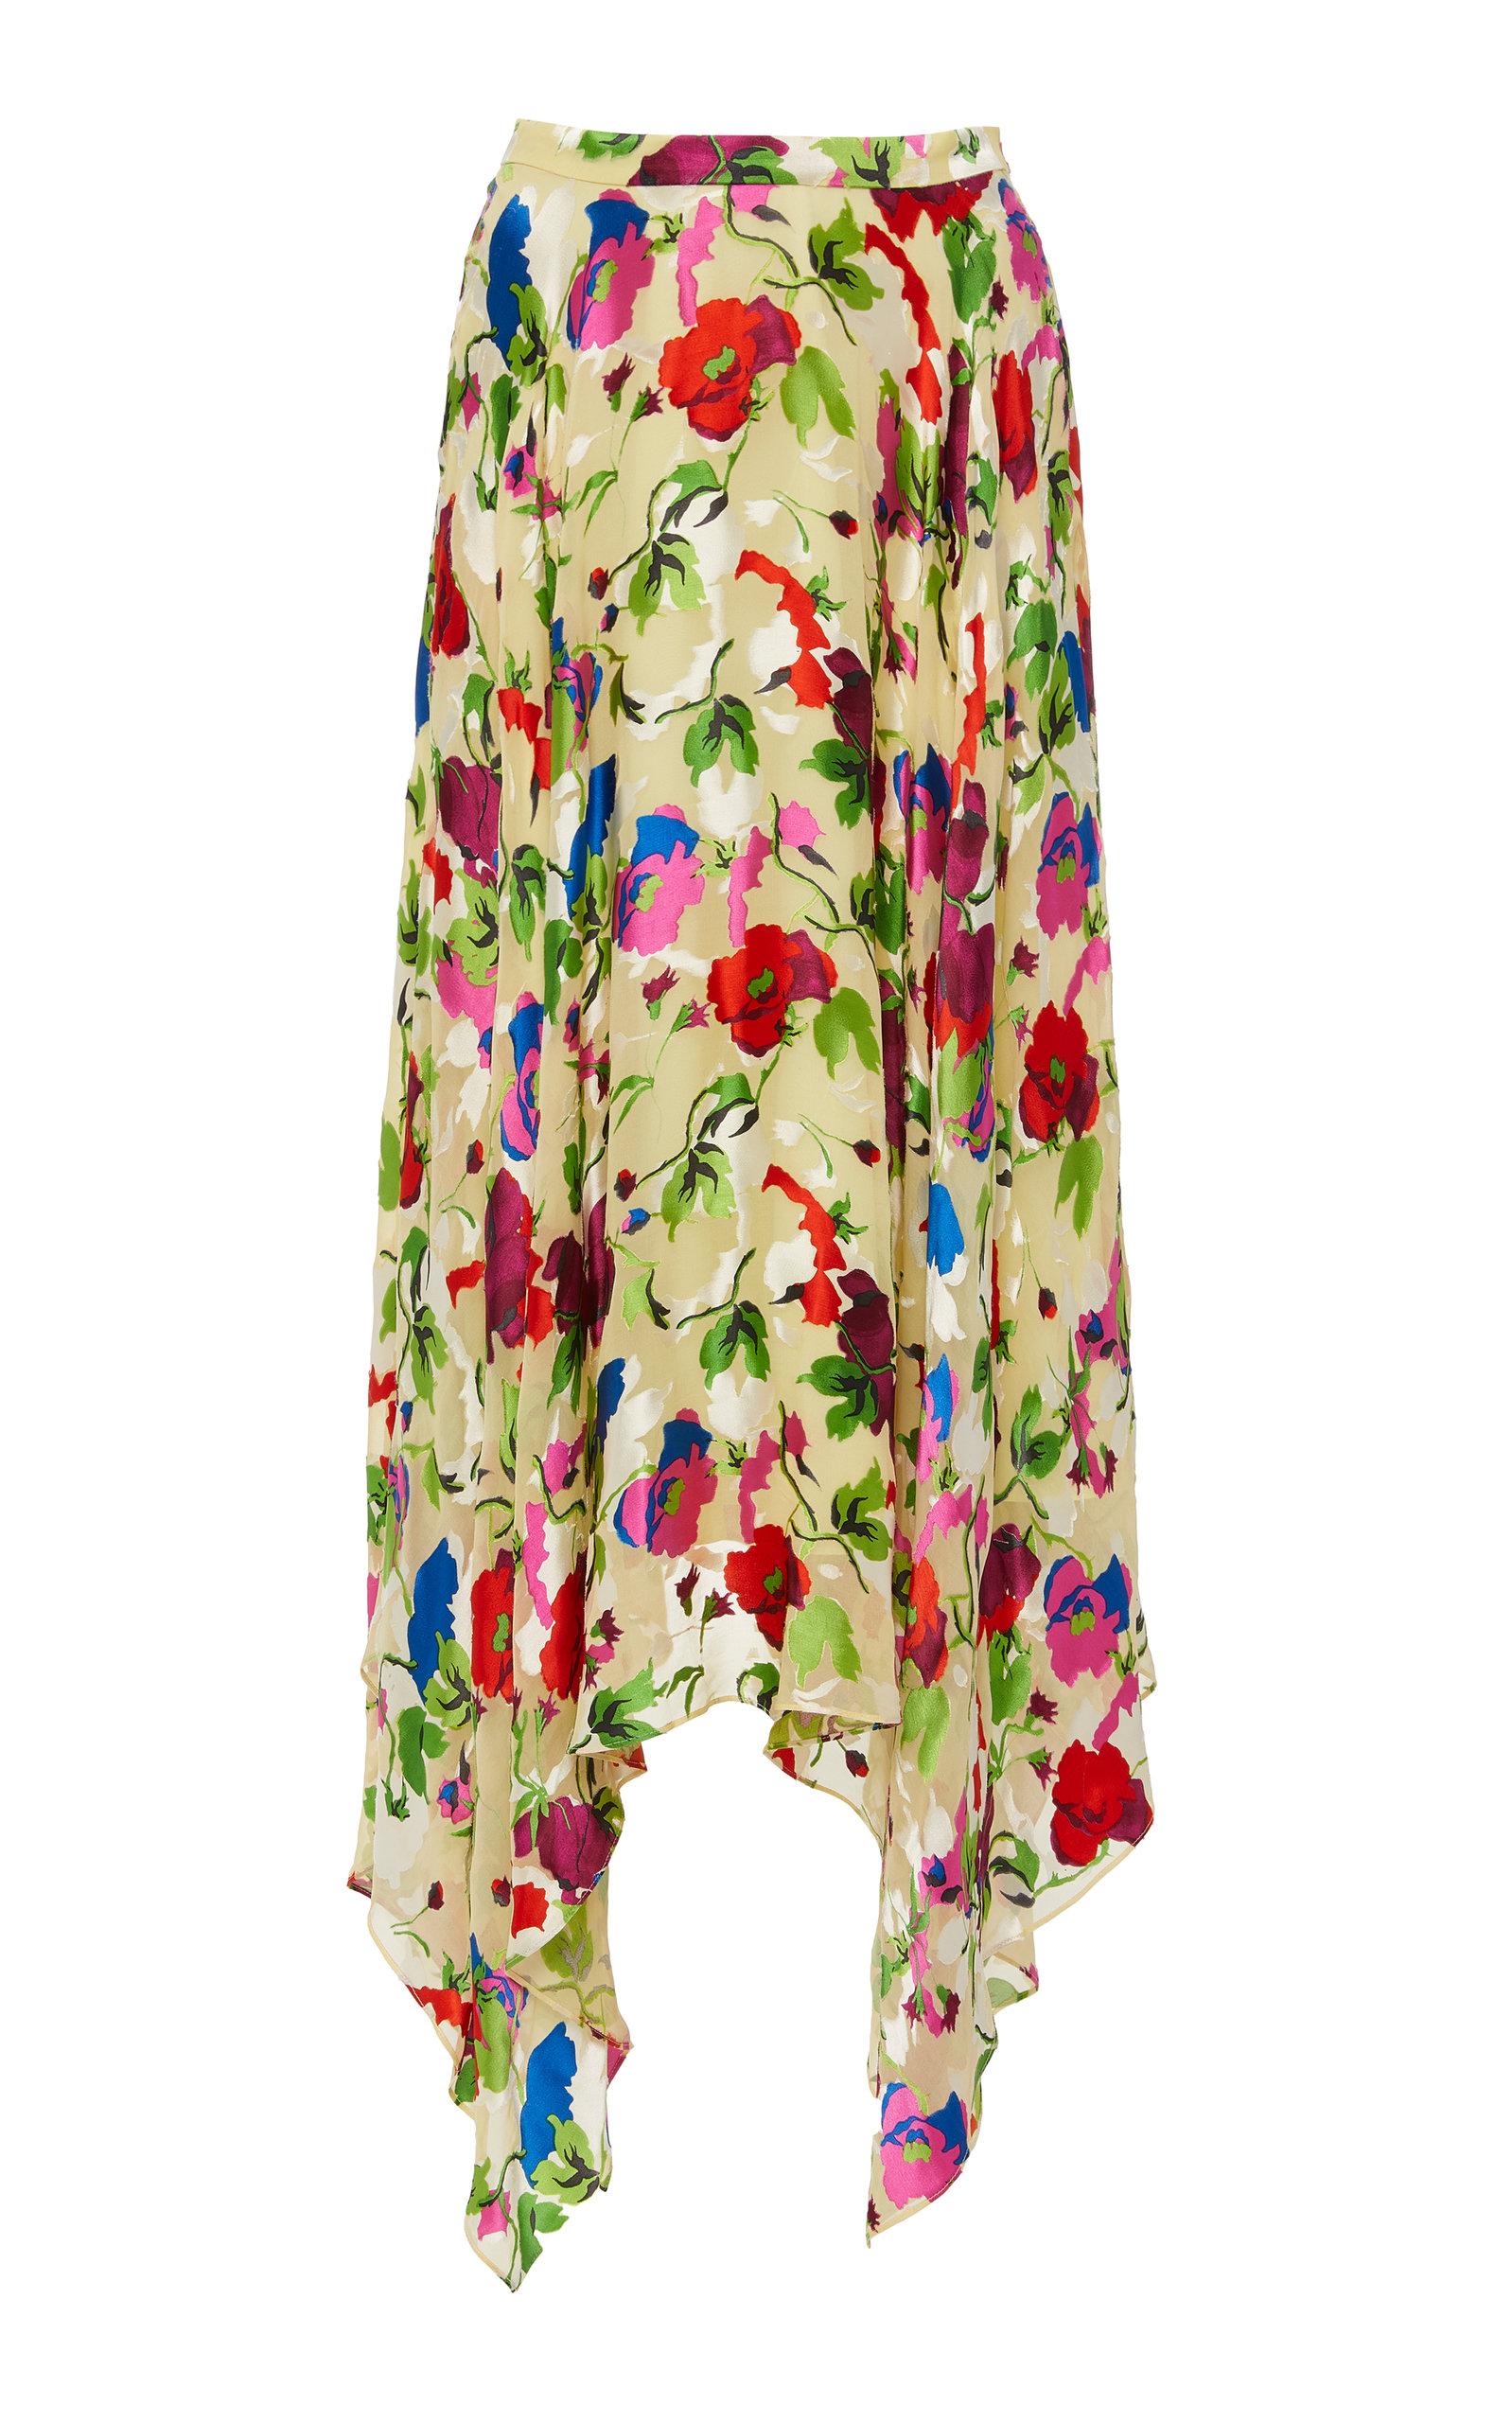 7be976bdba8 Wispy Floral Print Midi Dress